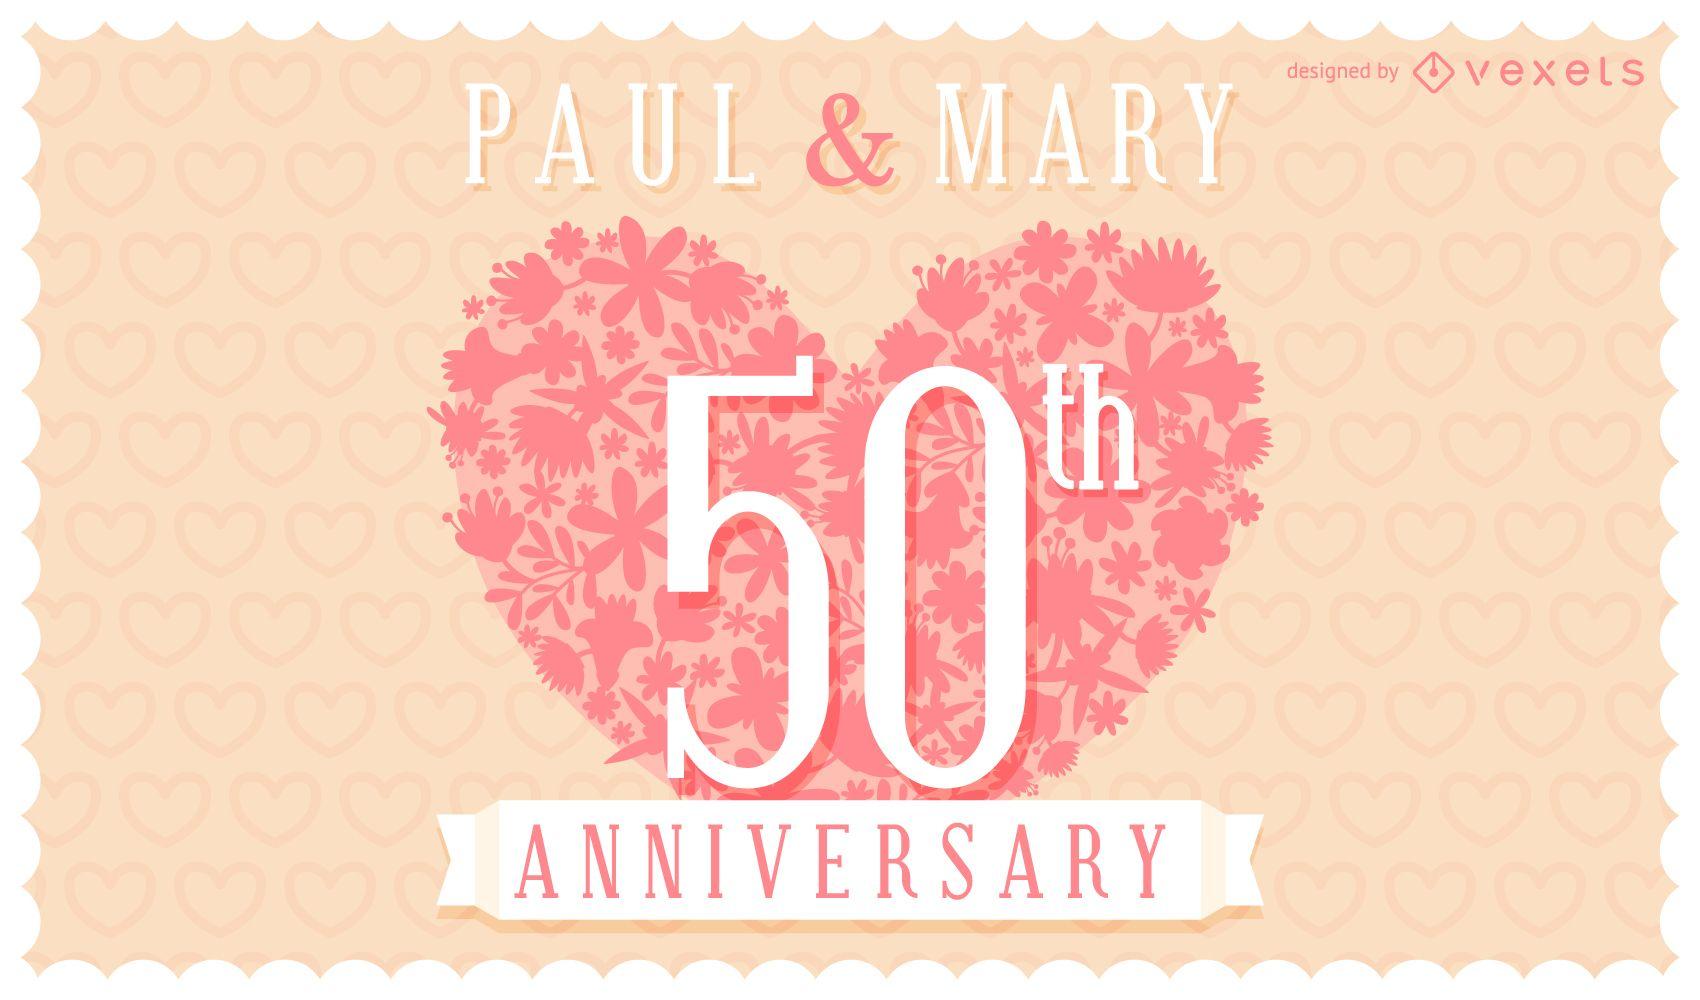 Floral wedding anniversary invitation card vector download for Wedding anniversary images download